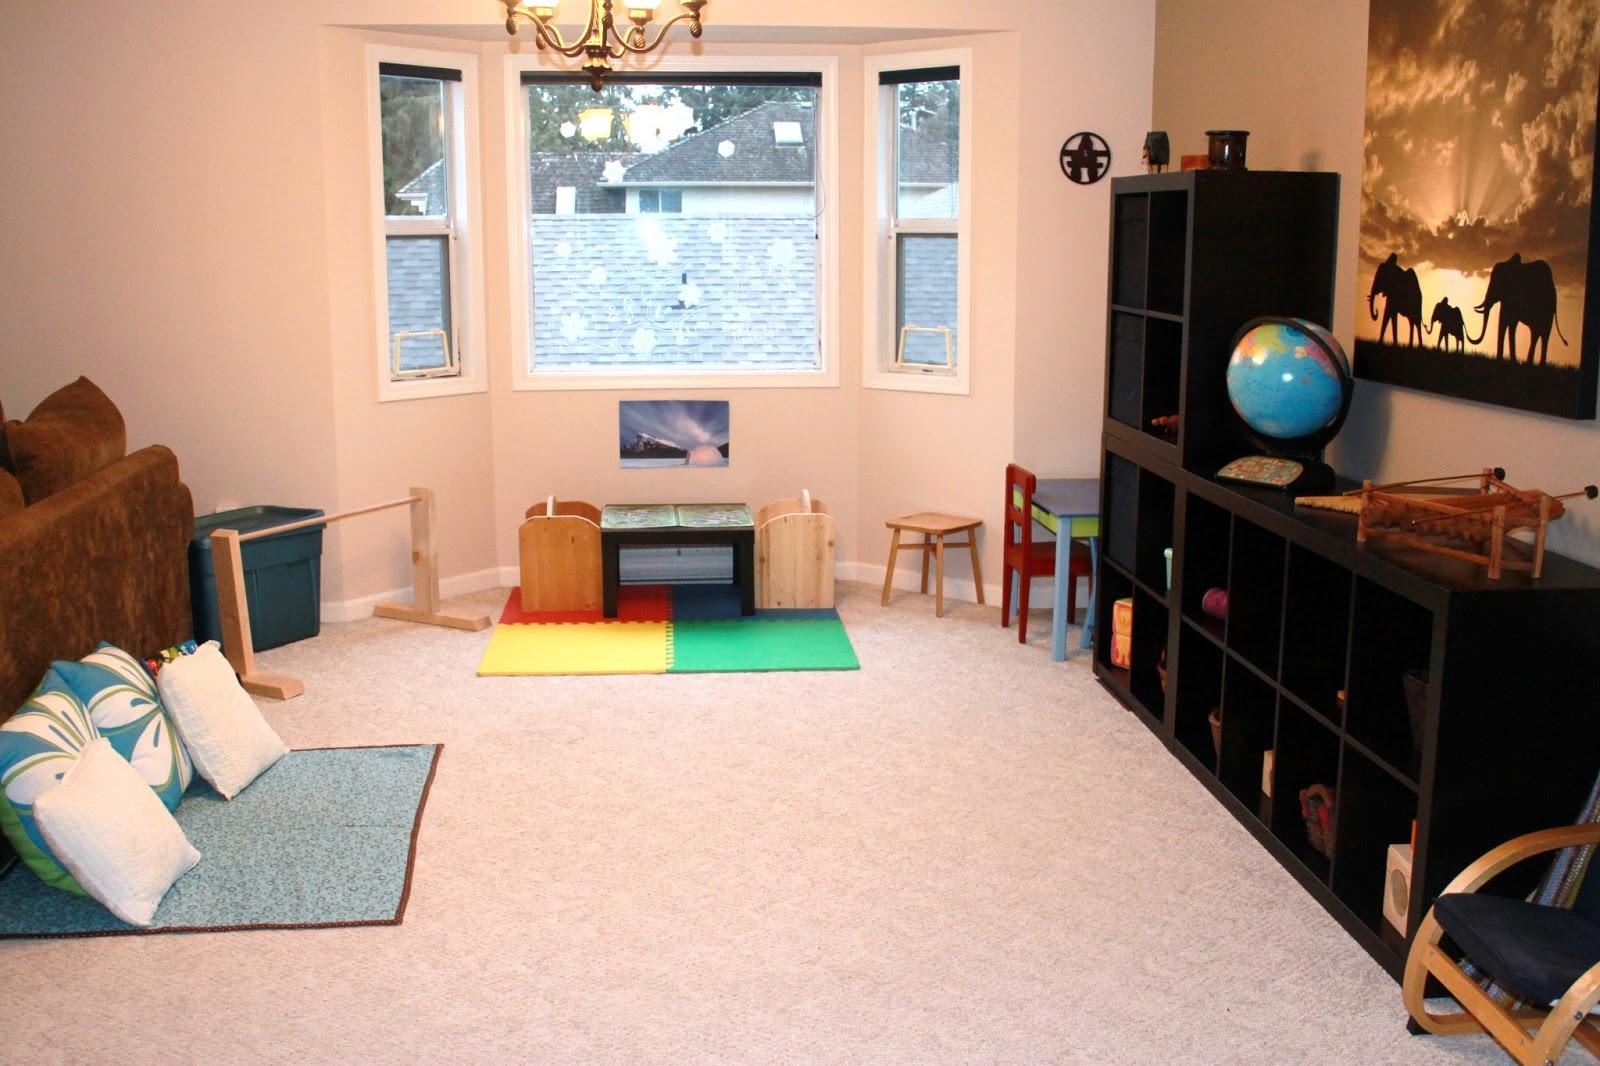 Montessori Beginnings Our Montessori Infant Environment : IMG7186 from montessoribeginnings.blogspot.com size 1600 x 1066 jpeg 260kB